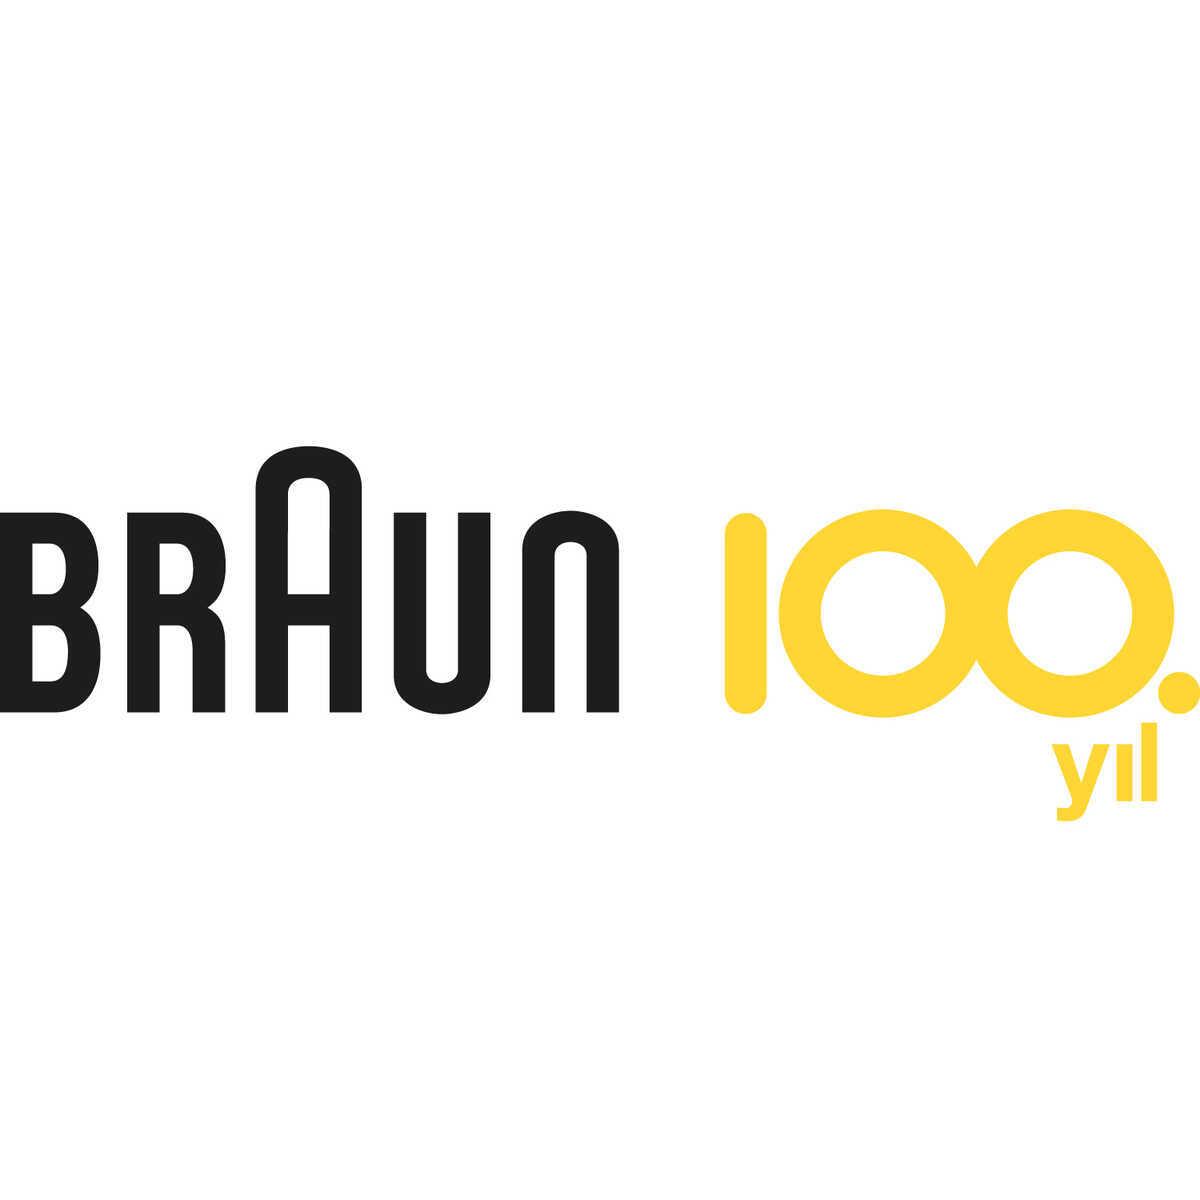 Braun Seri 6 B1200s Kablosuz Tıraş Makinası, SensoFlex, EasyClick Islak & Kuru